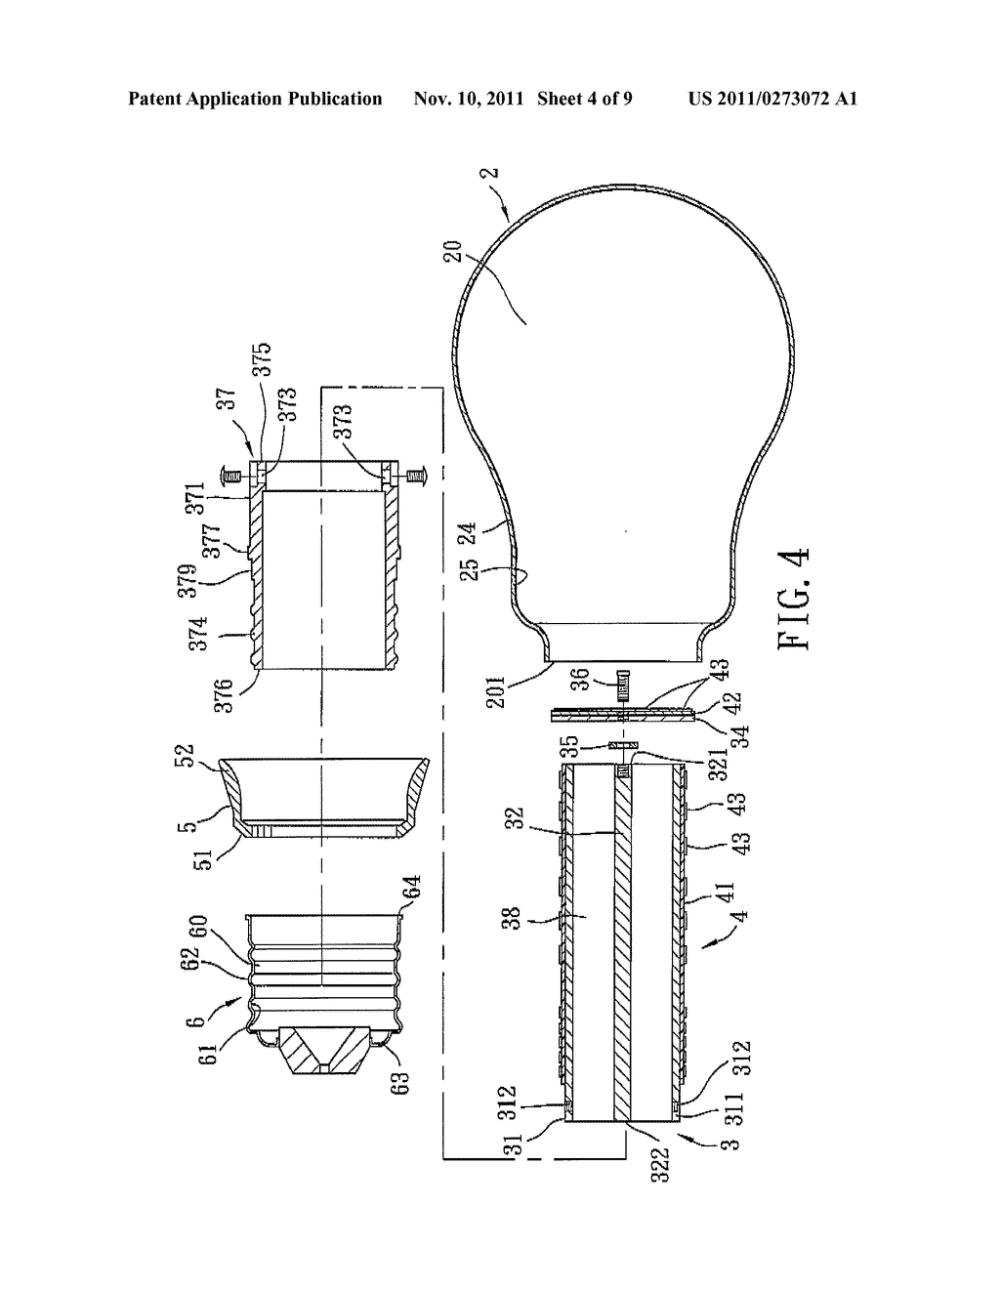 medium resolution of light bulb schematic simple wiring diagram schema light bulb schematic light bulb schematic